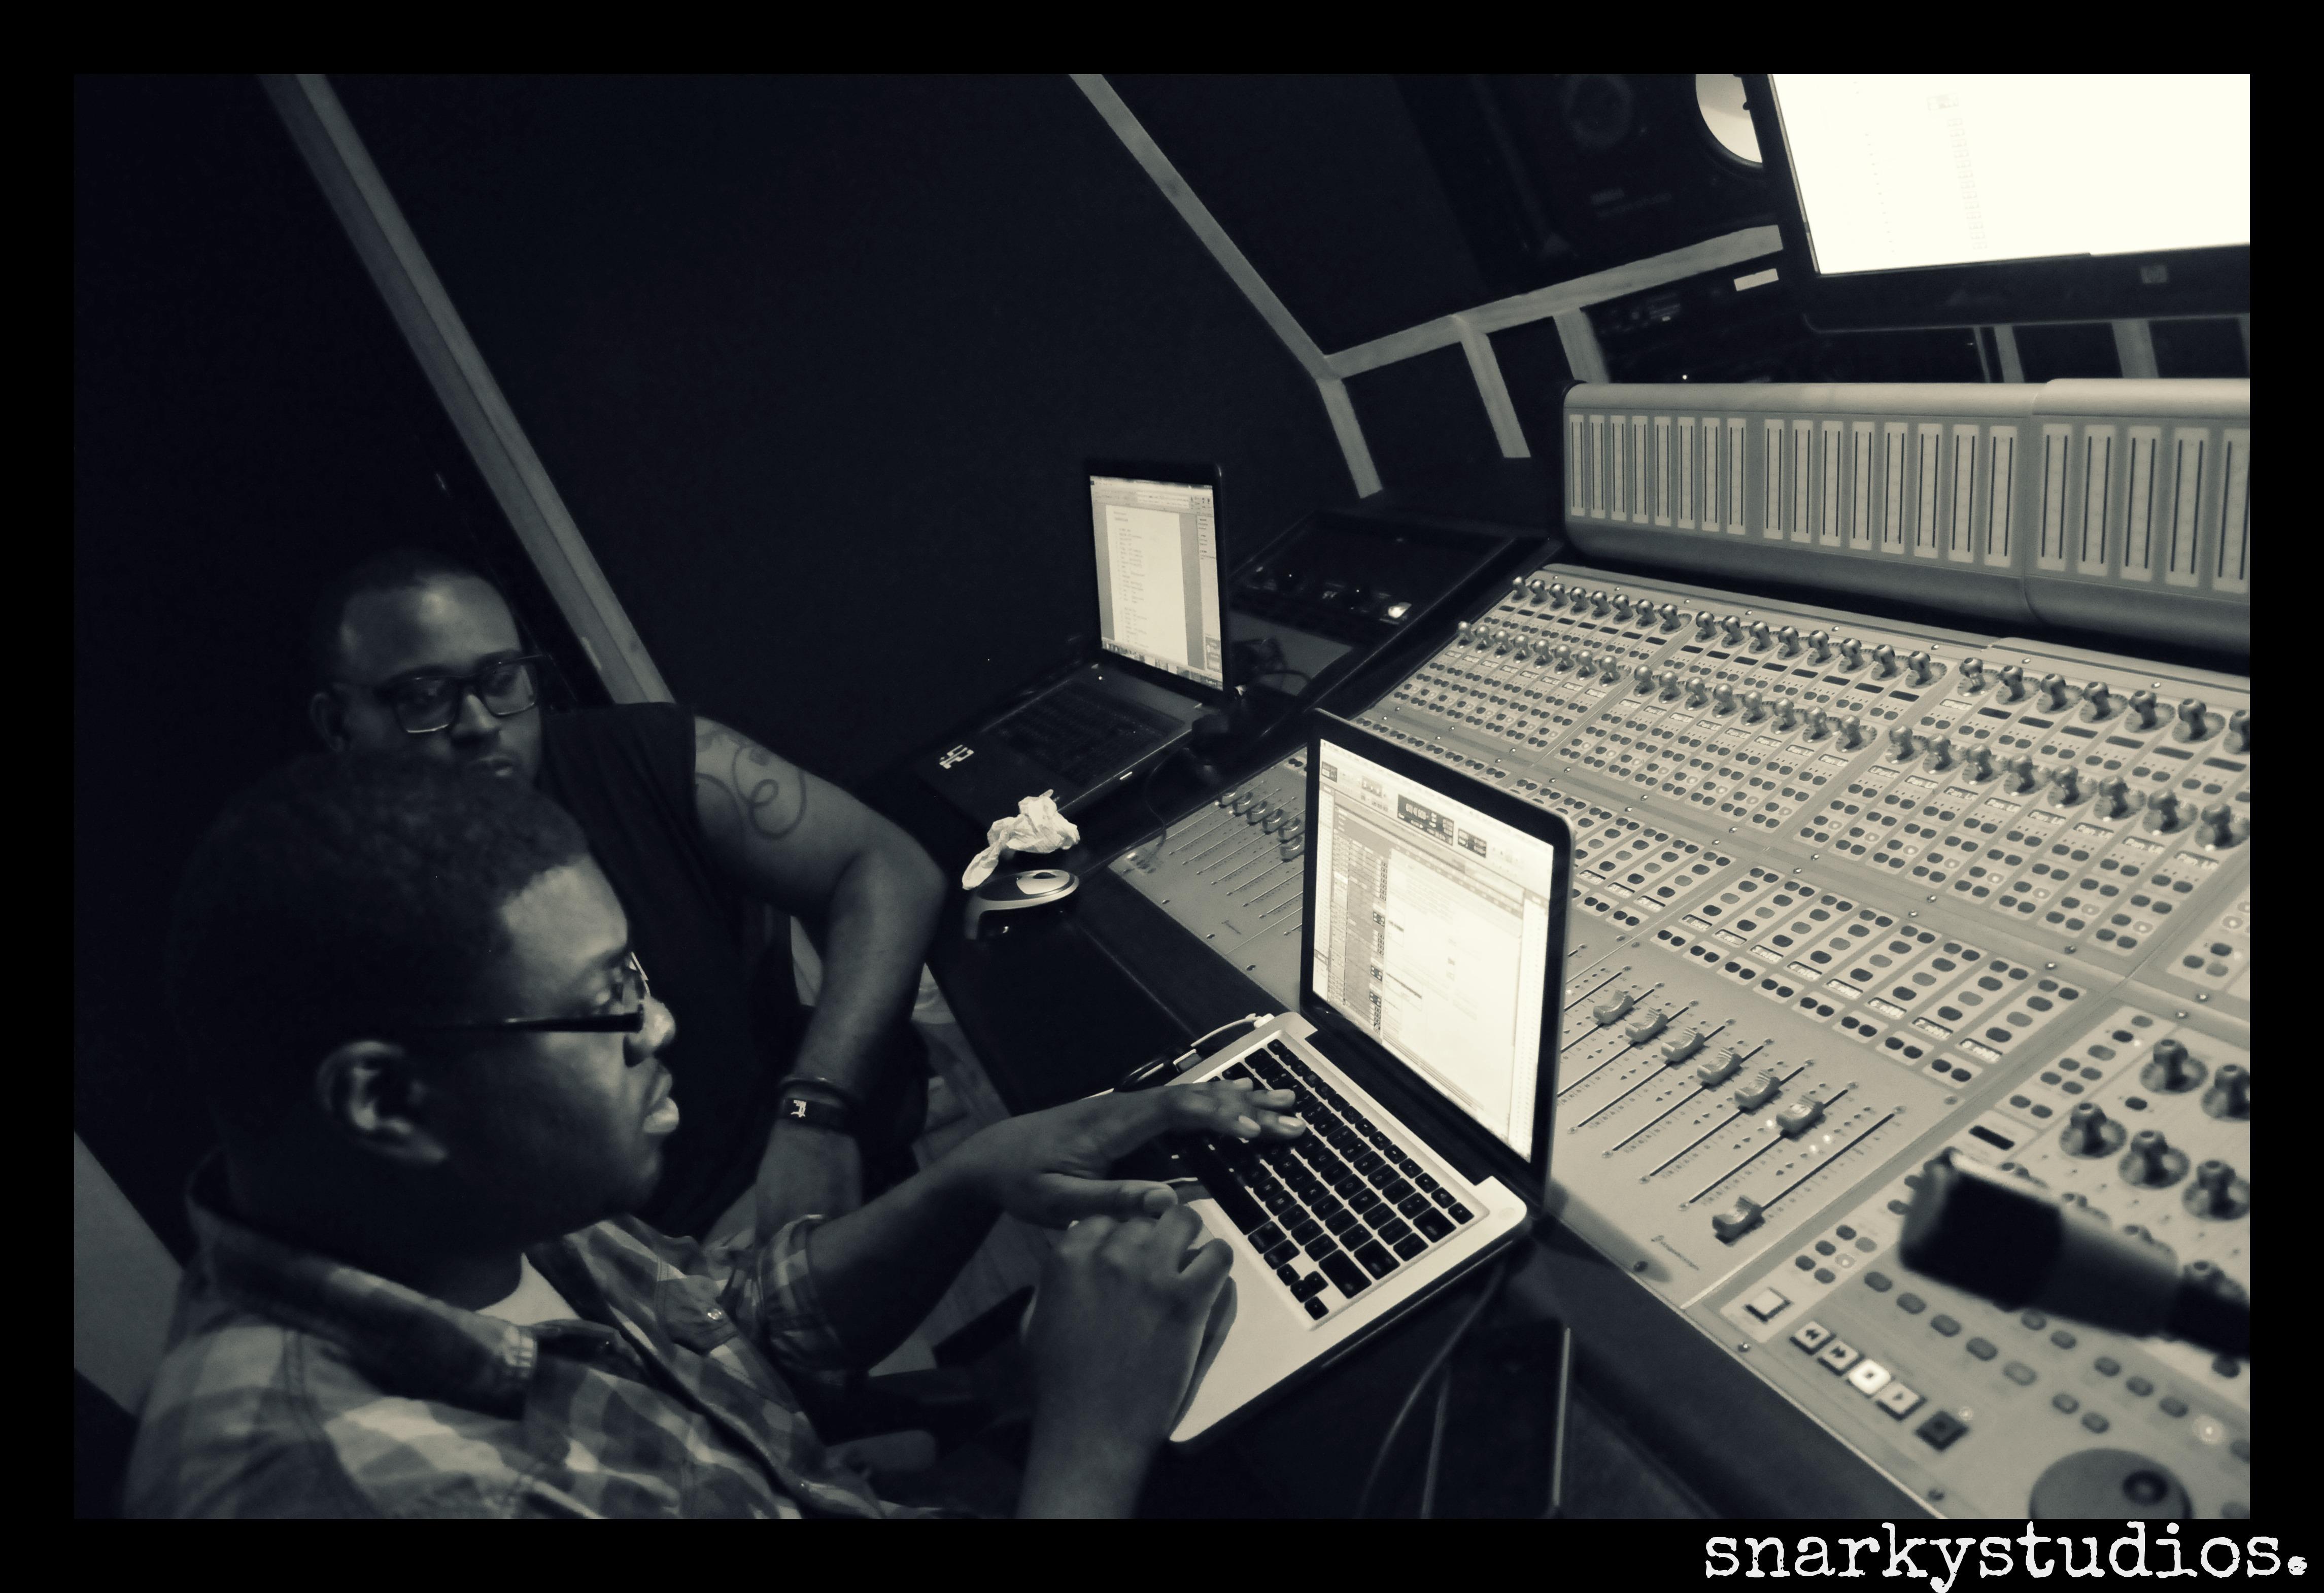 marcus george studio verb studios 06.30.13 snarky